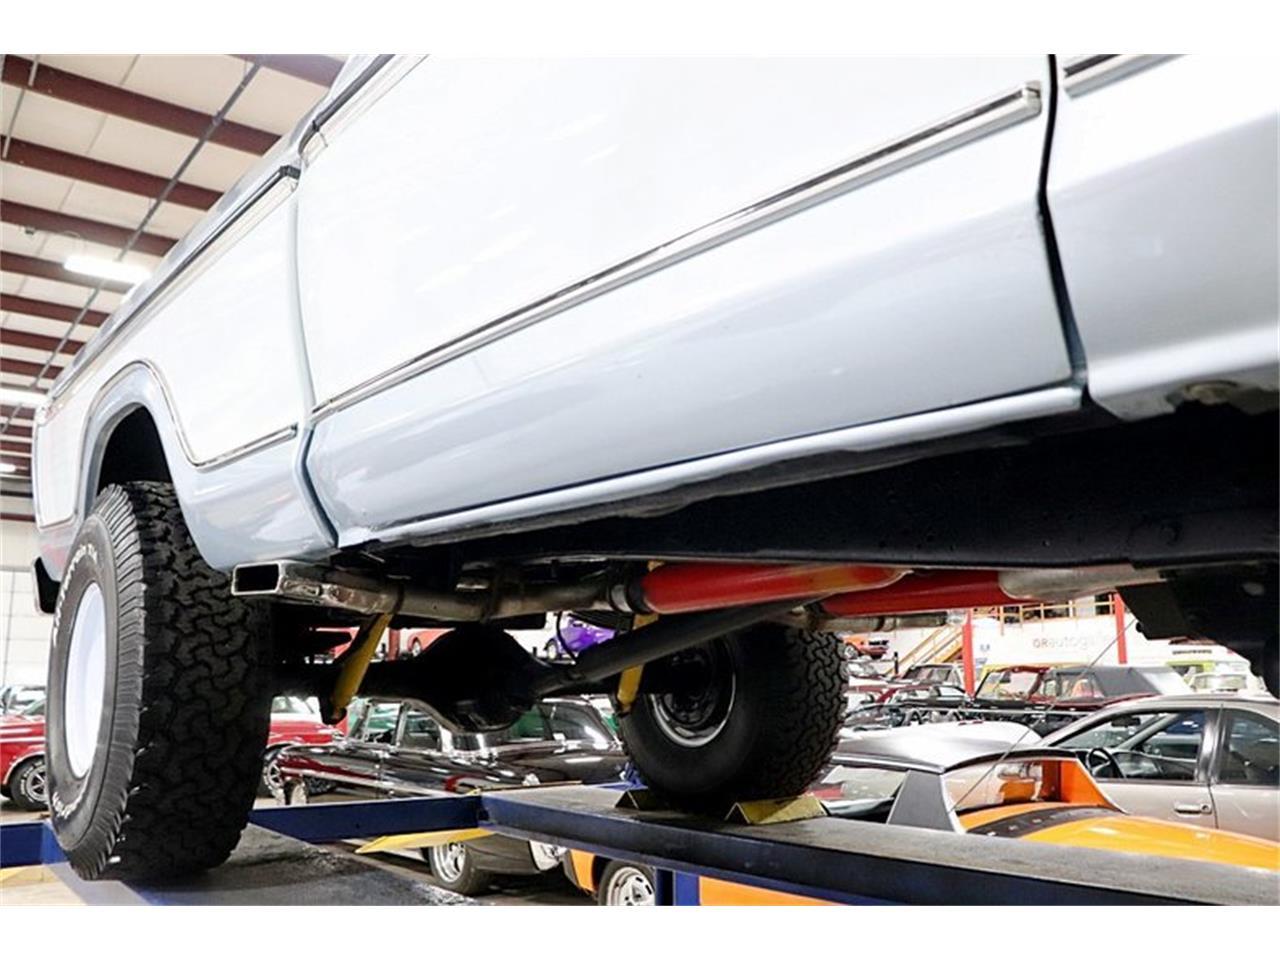 Large Picture of '78 F150 located in Michigan - $23,900.00 - Q4L9